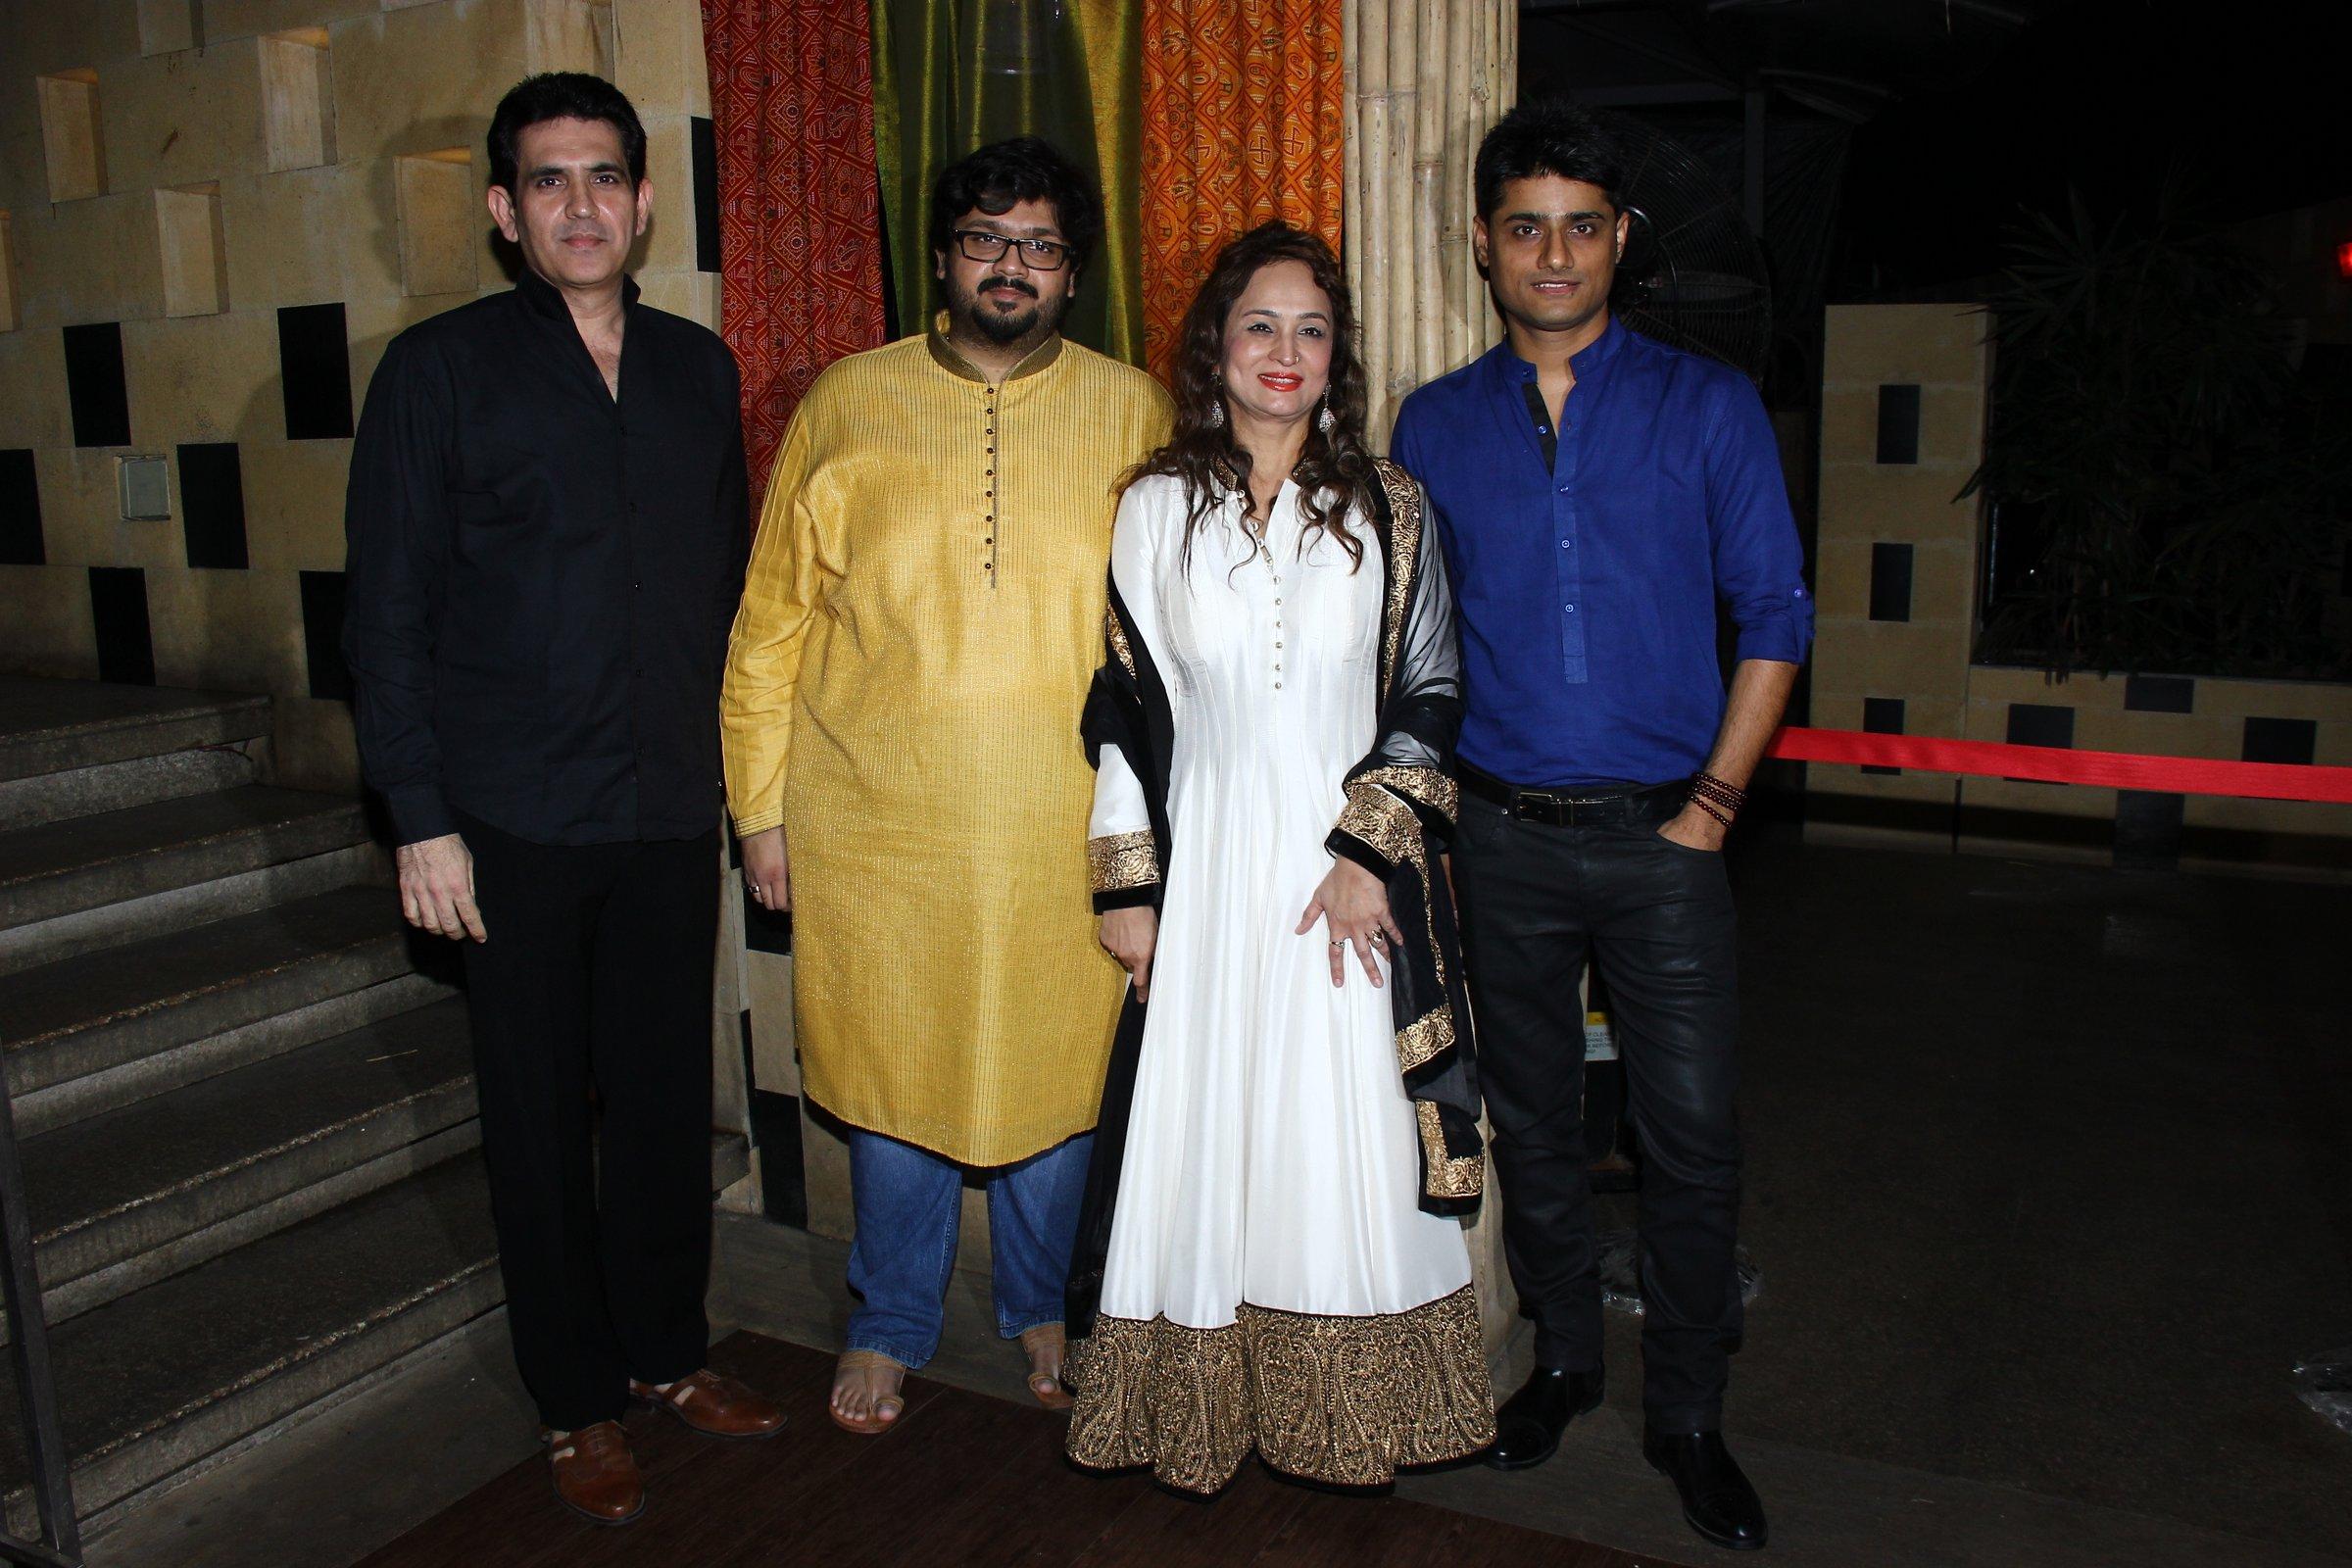 L to H -Omang Kumar, Rahul Thackeray , Smita Thackeray and Producer Sandeep Singh